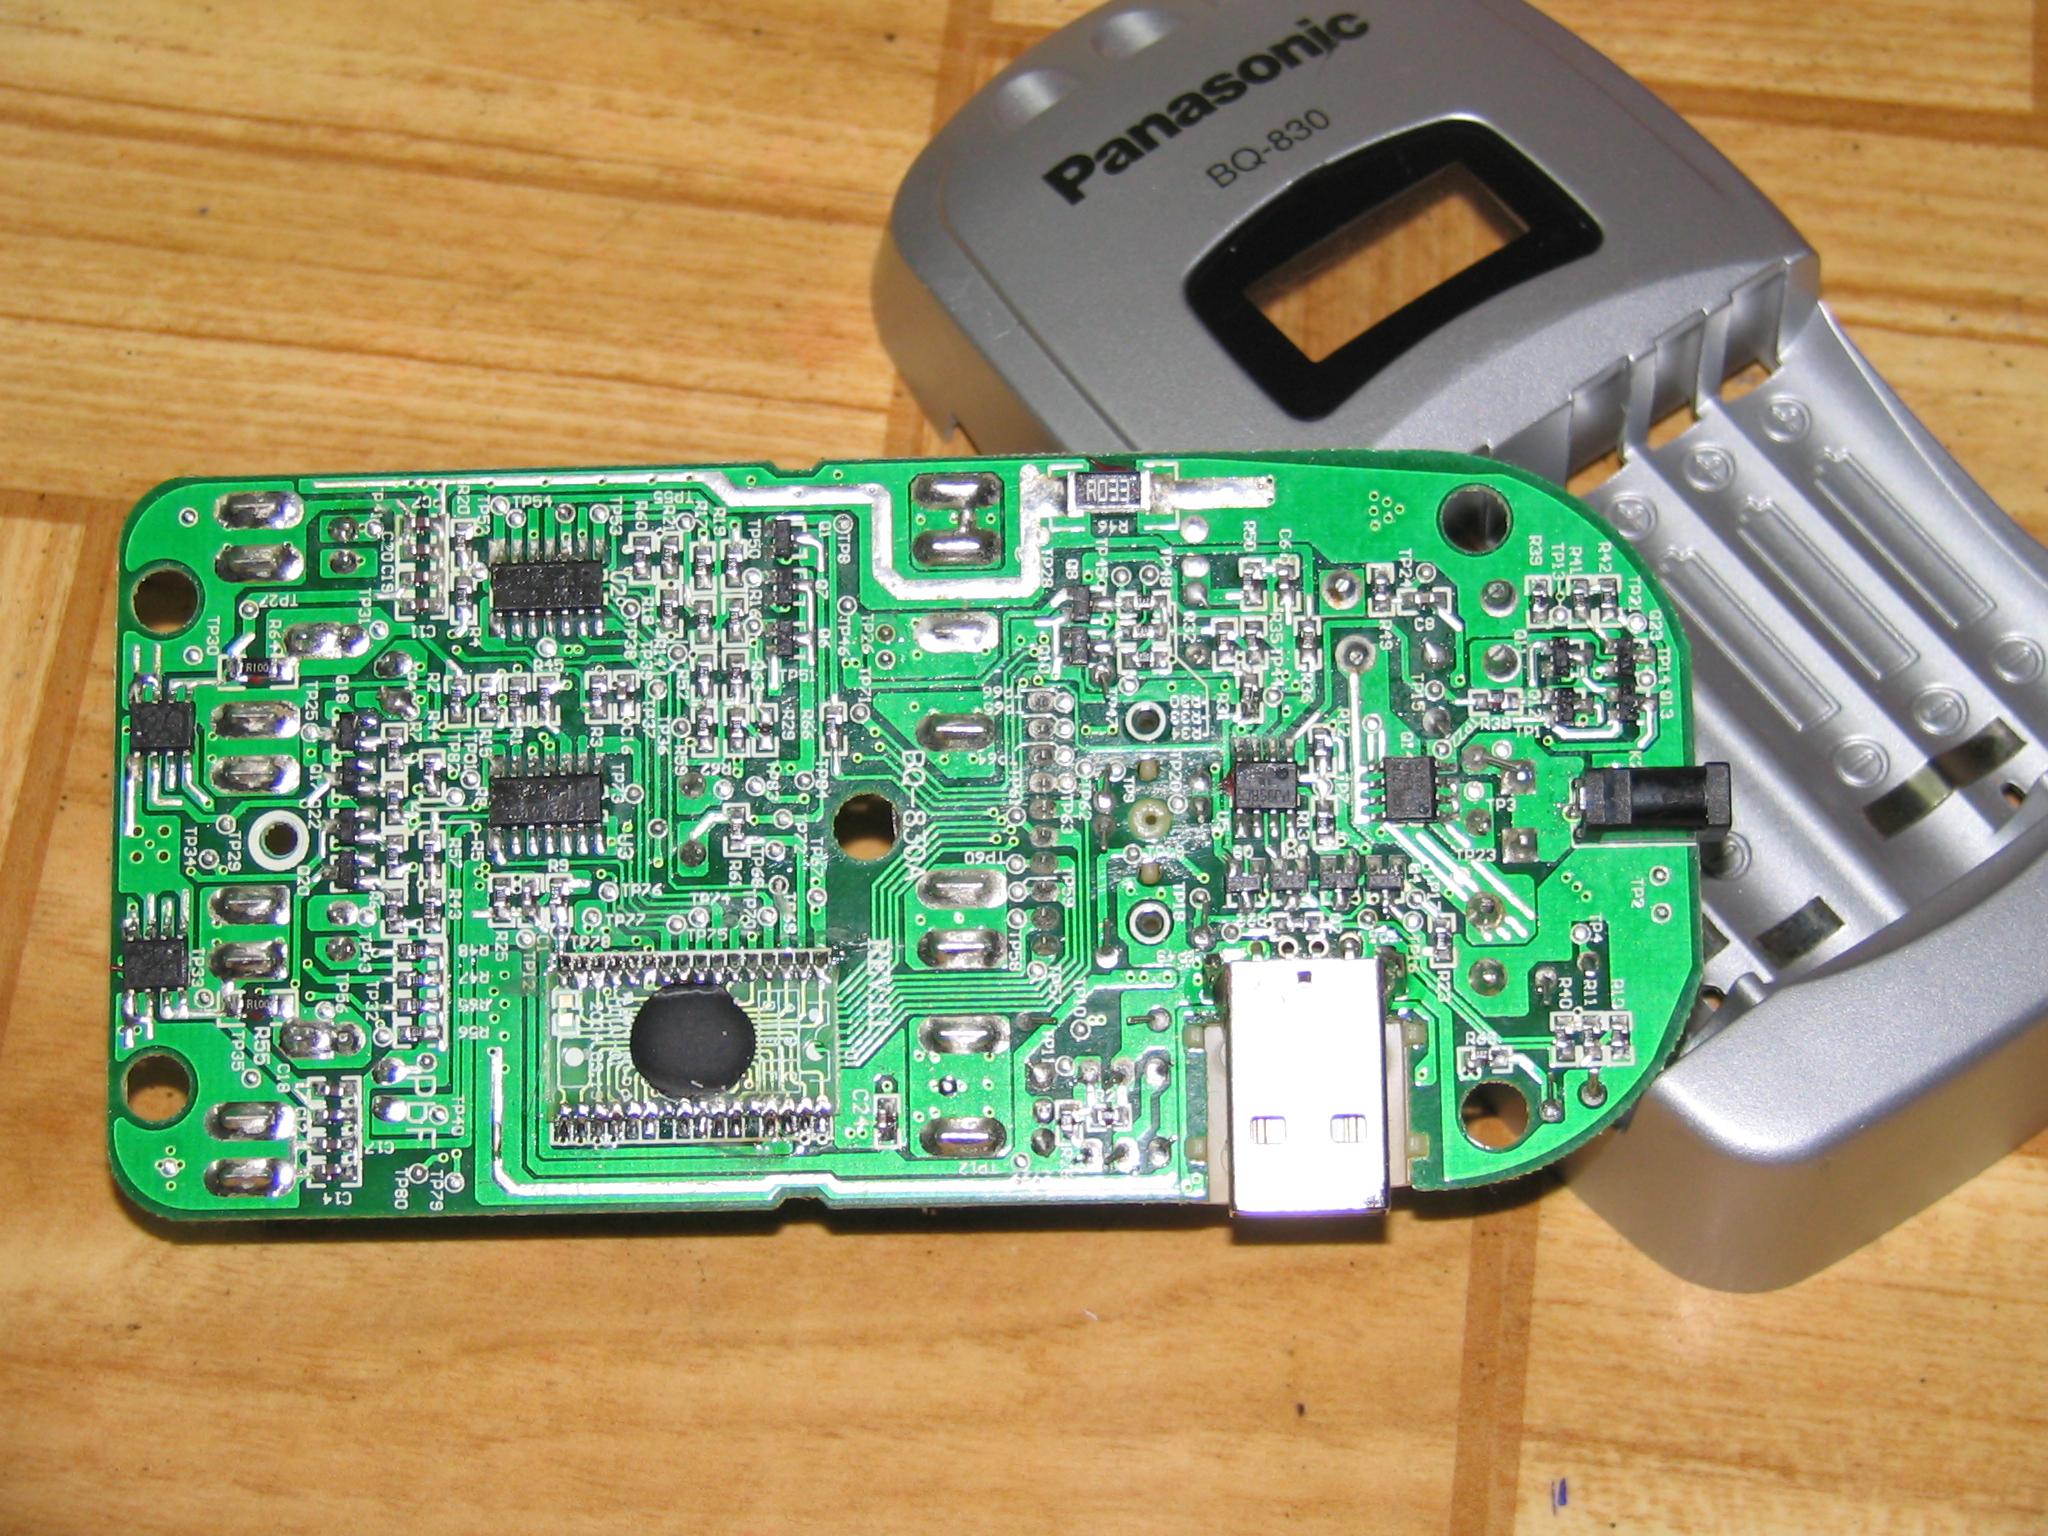 bq-830a智能充电器内部结构!-电源网